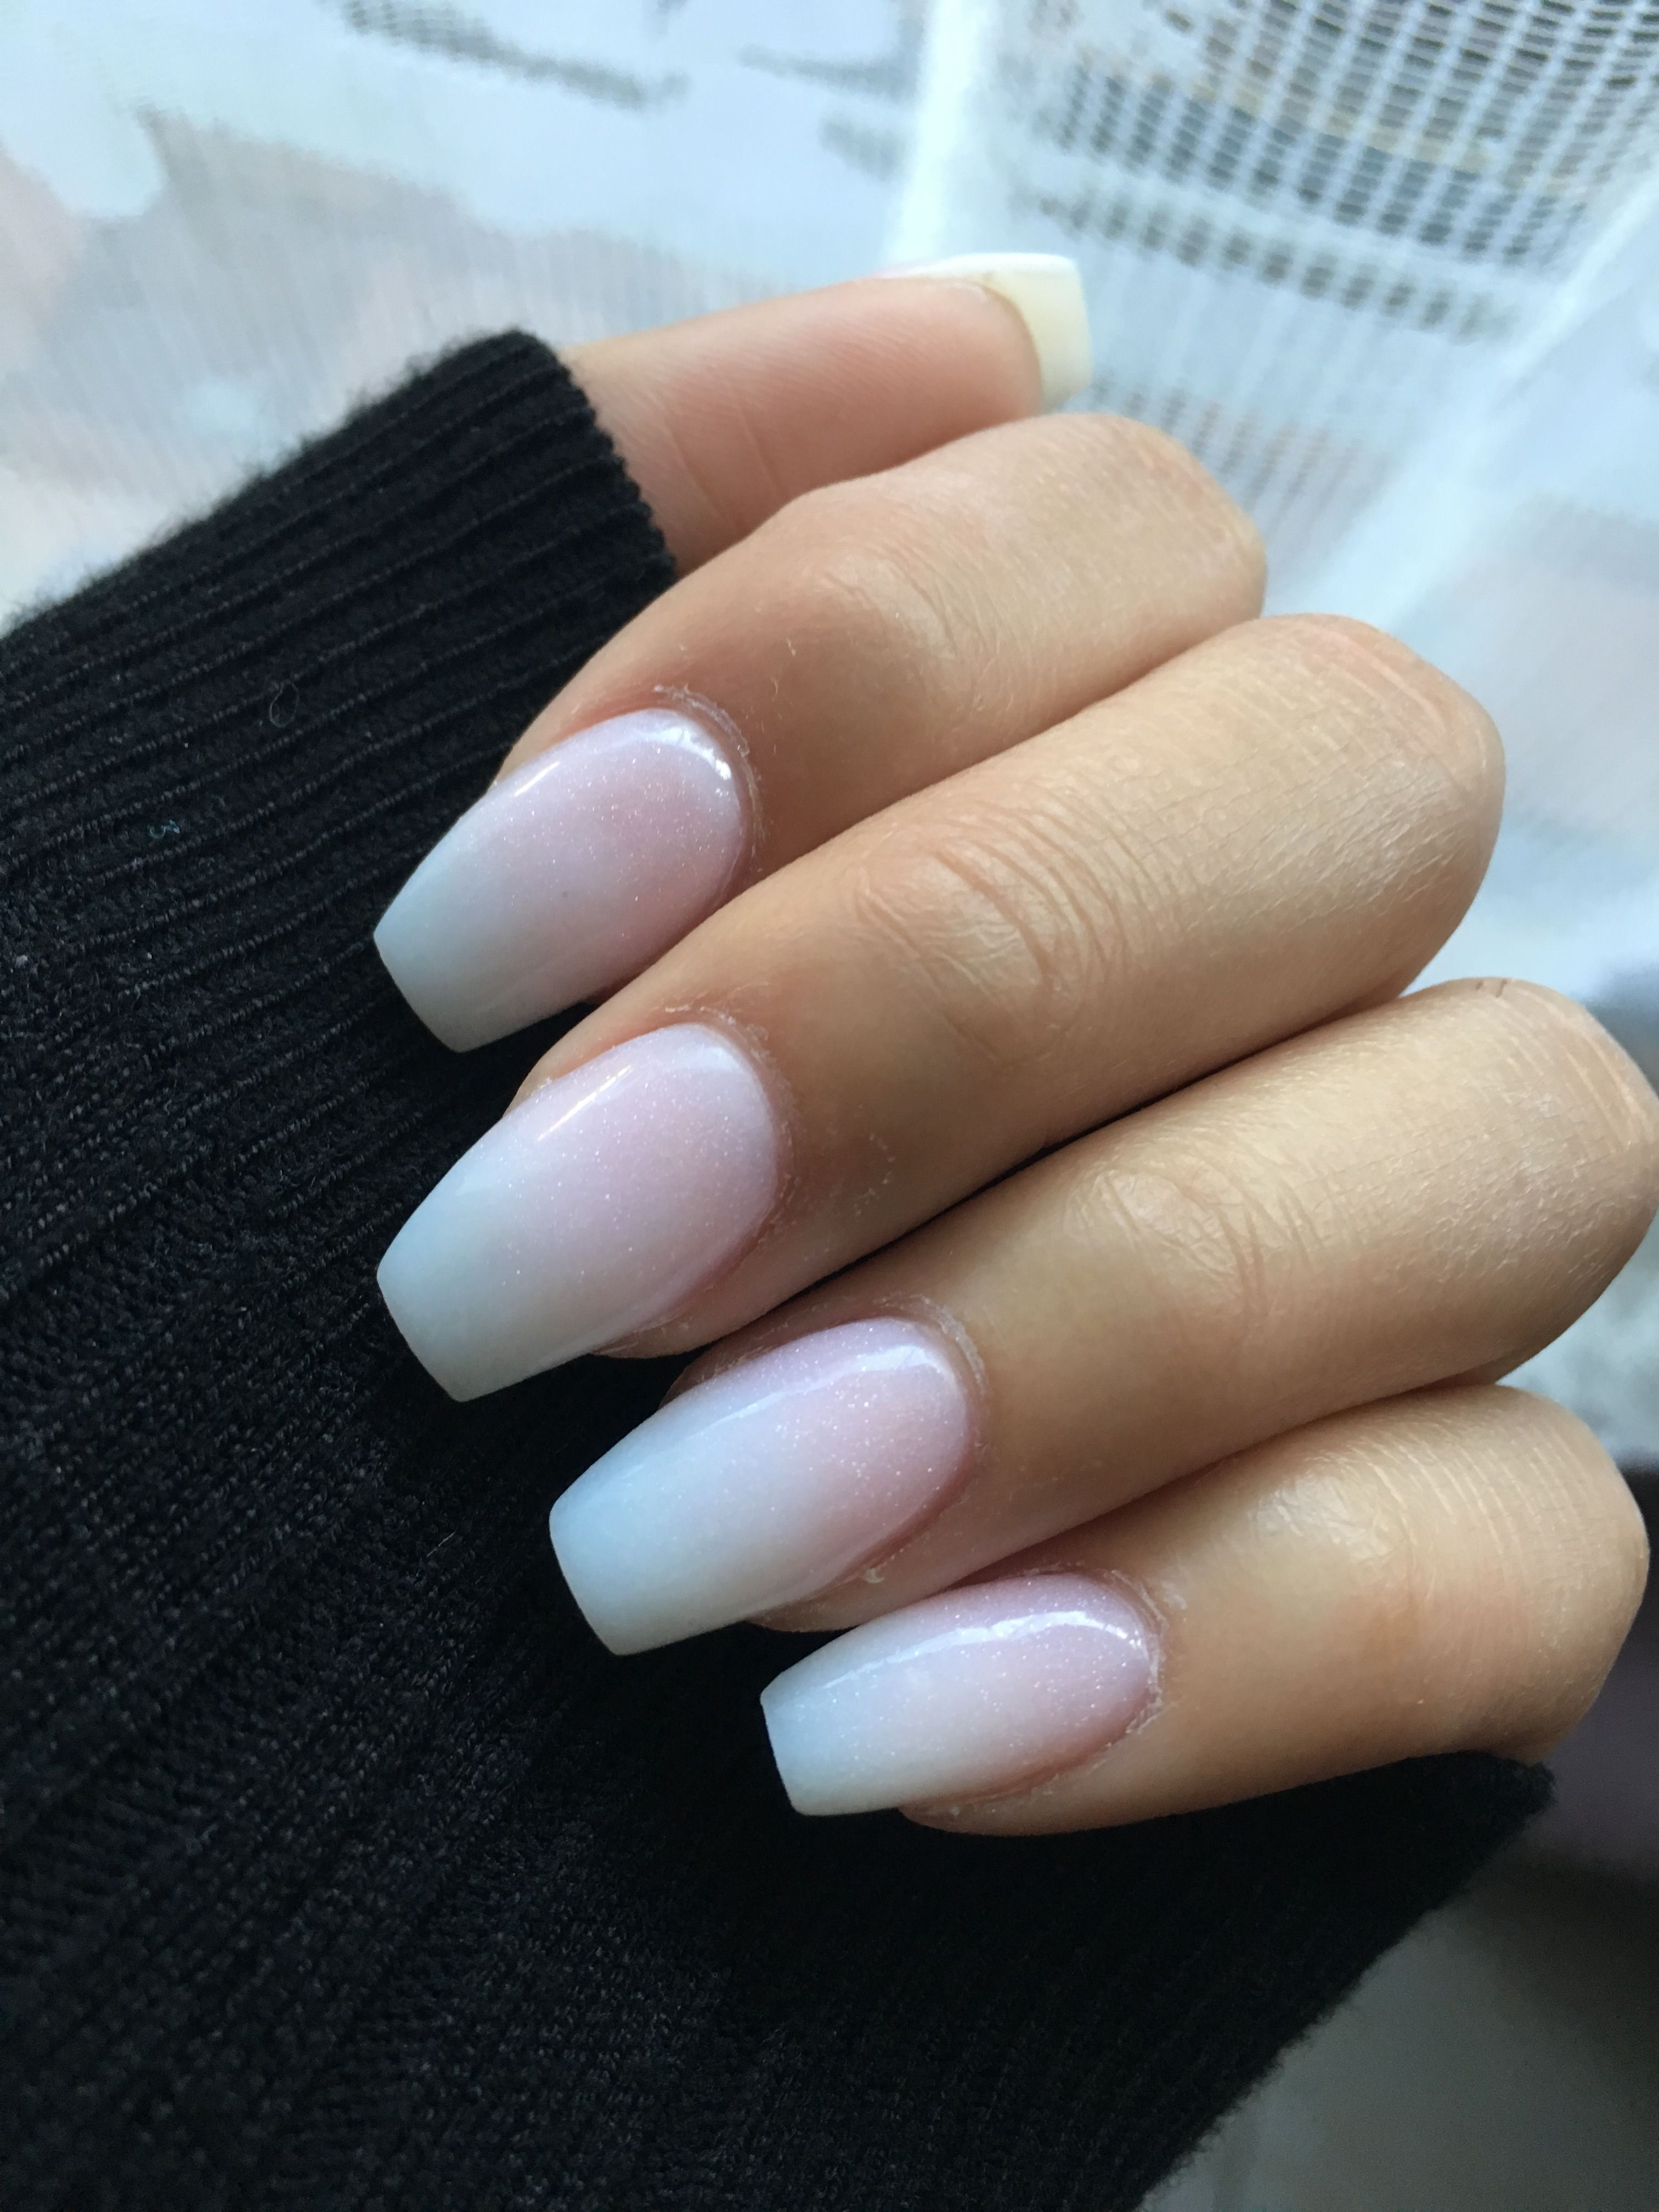 New Nails French Ombre French Fade Paznokcie Makijaz